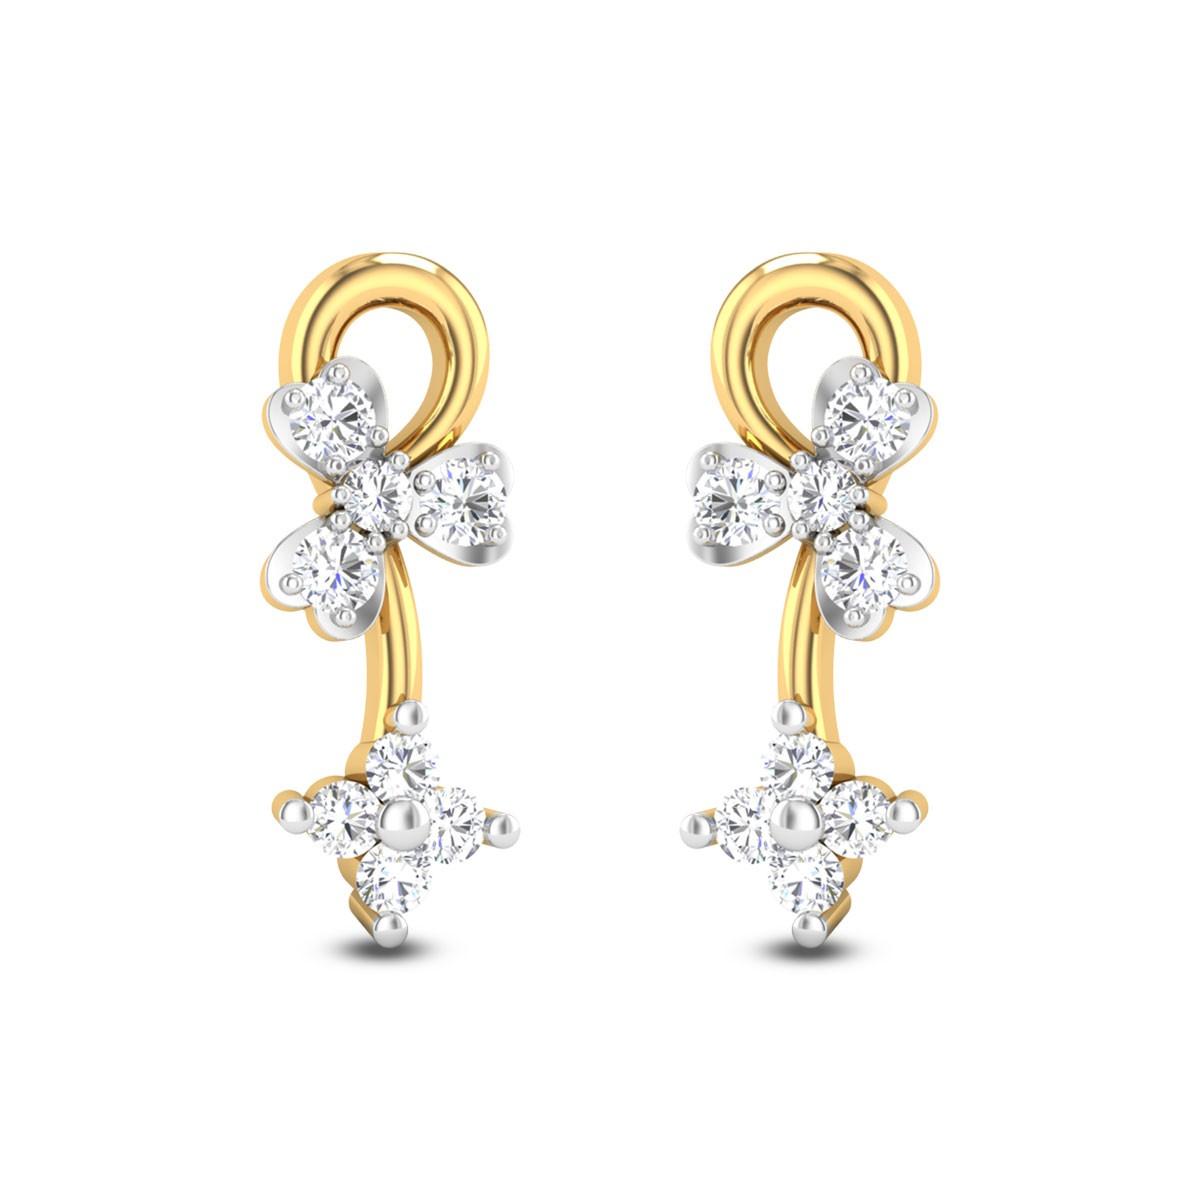 Dual Orchid Diamond Earrings